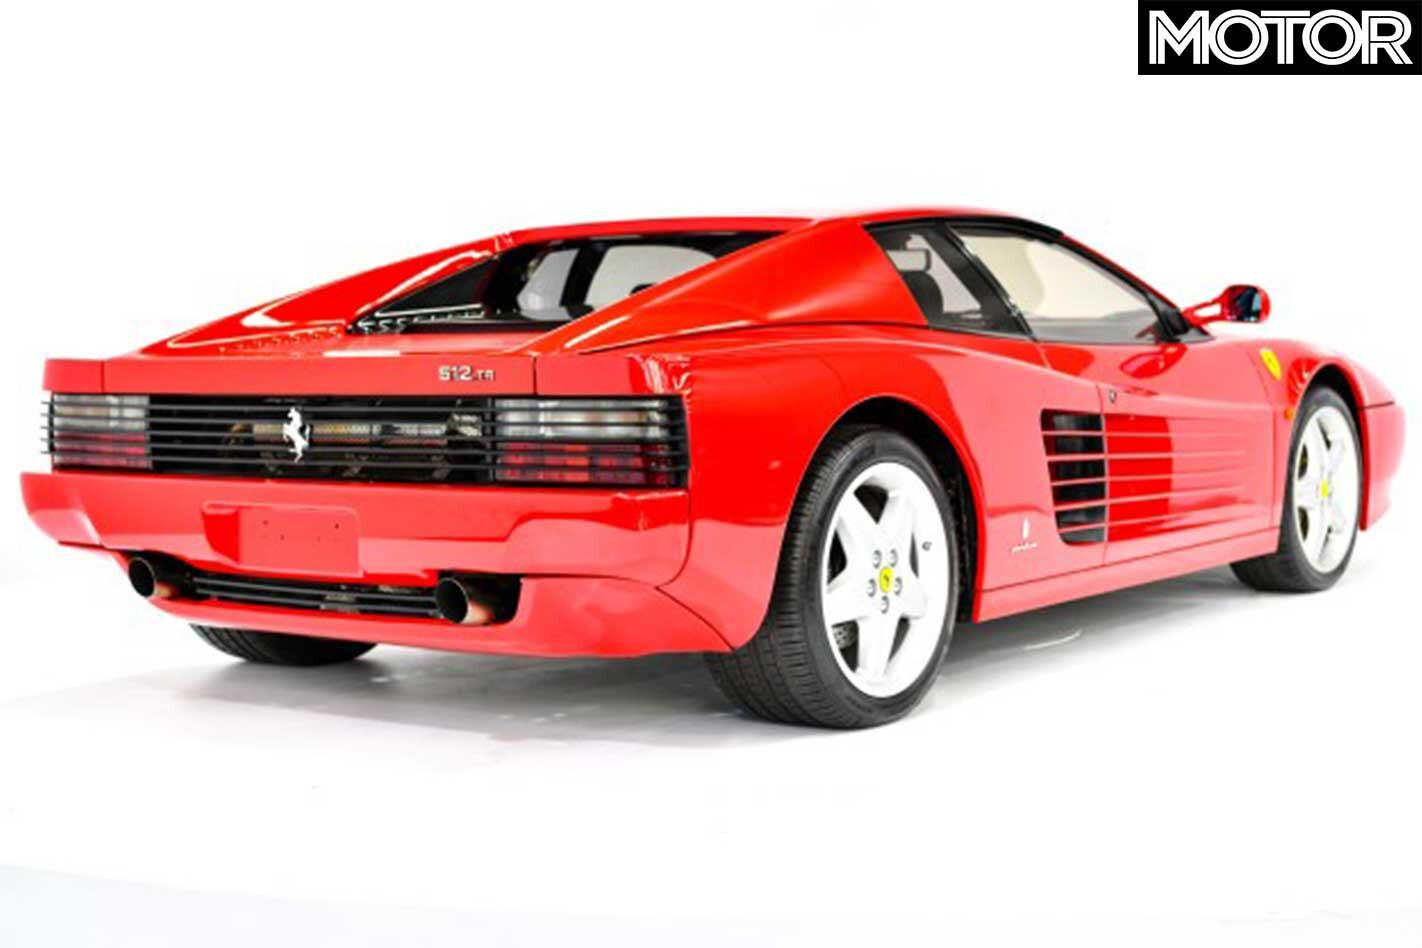 Gosford Classic Cars Auction Ferrari Testarossa Rear Jpg